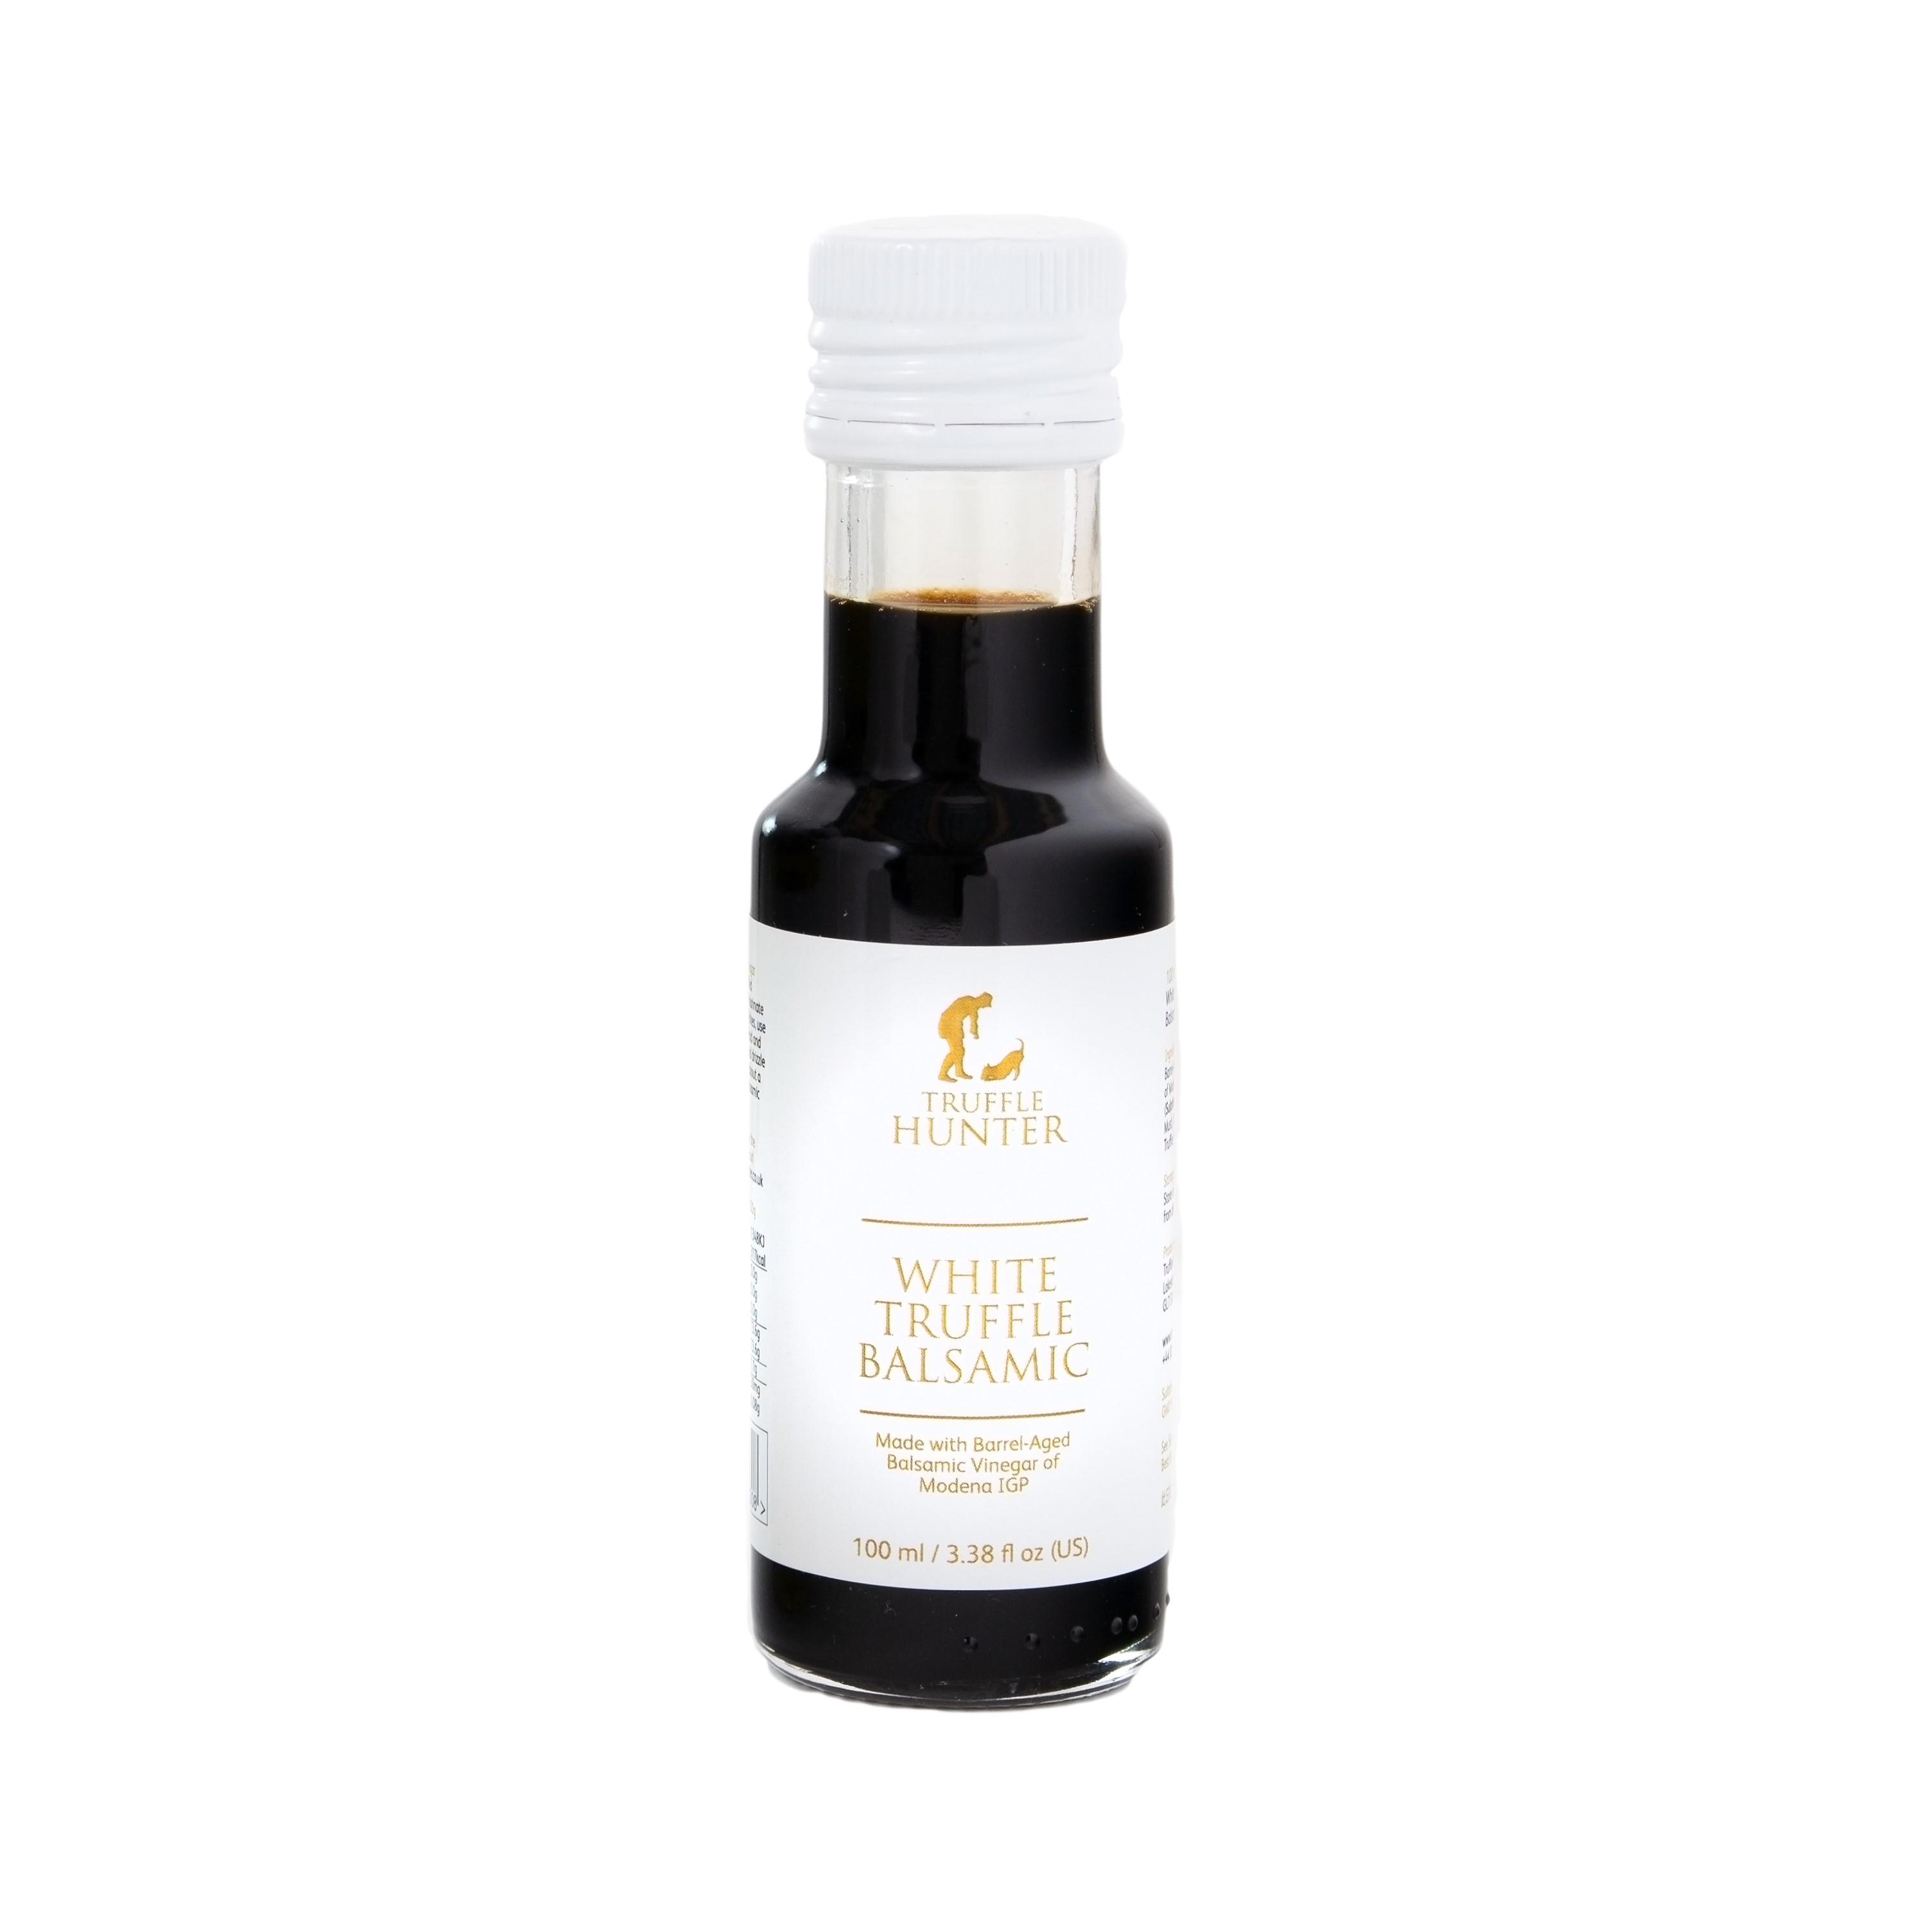 Truffle Hunter White Truffle Balsamic Vinegar 100ml